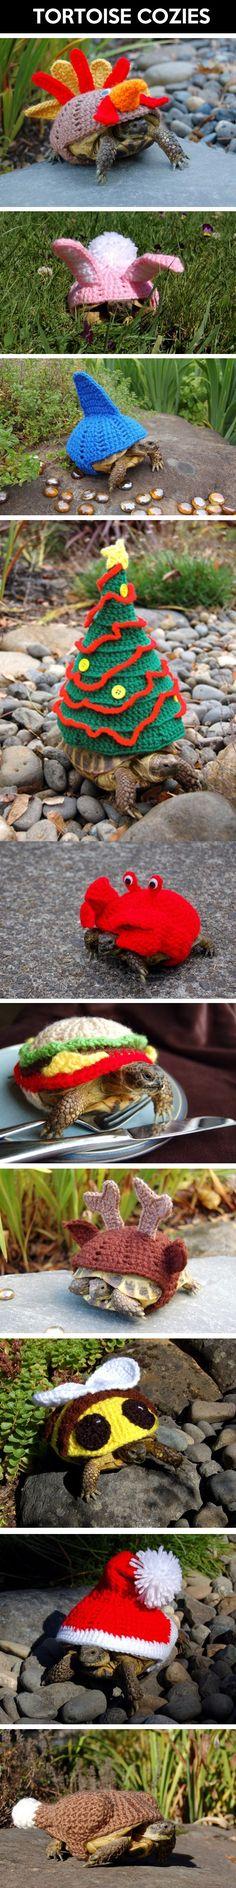 Tortoise Cozies. I cracked up when i saw the tortoise burger cozie!